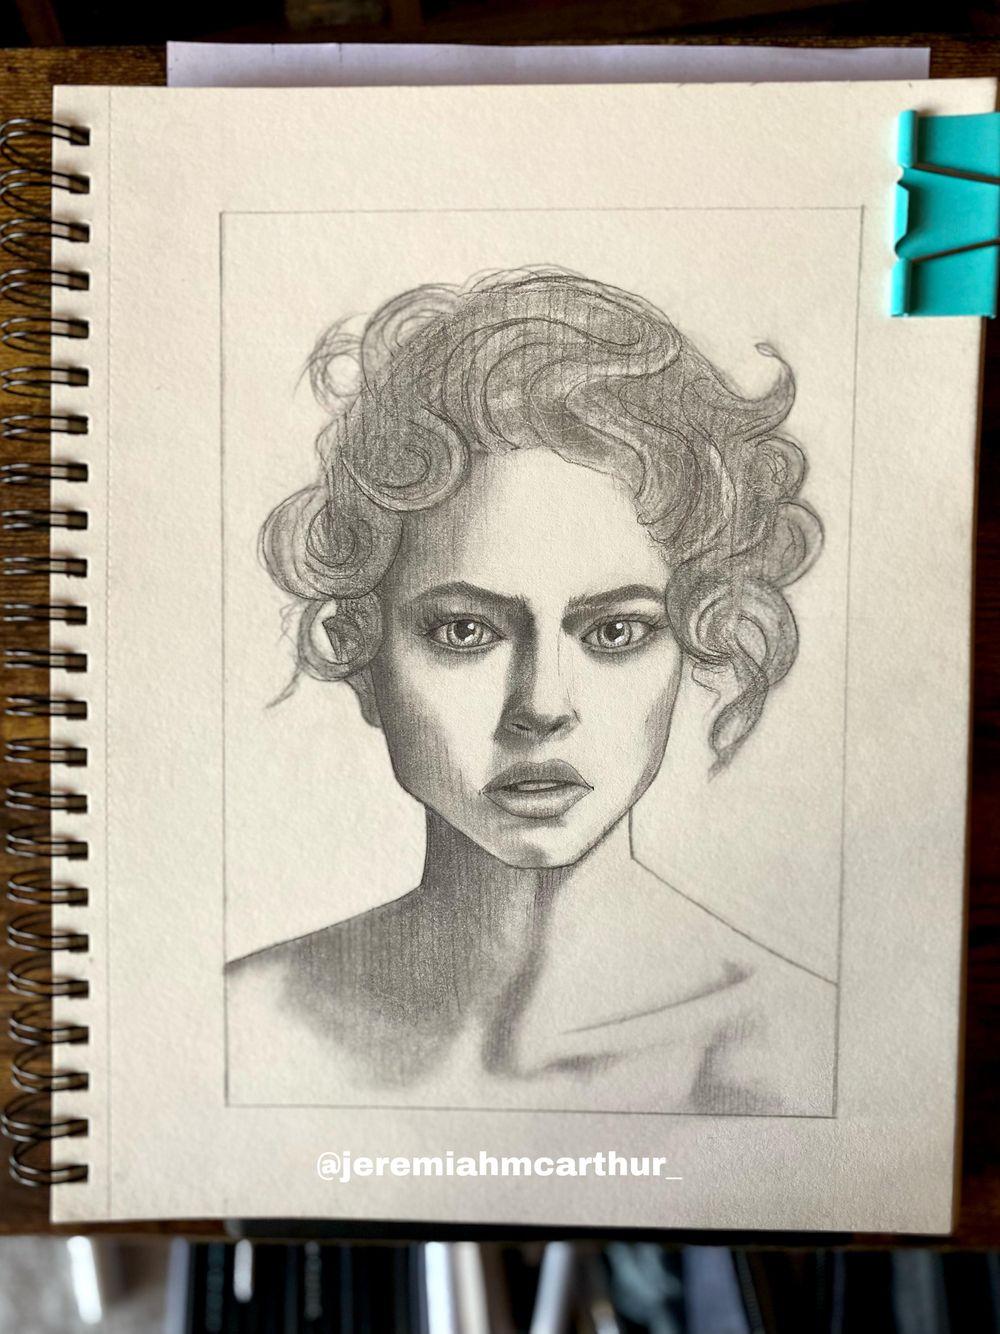 Stylized Portrait - image 3 - student project